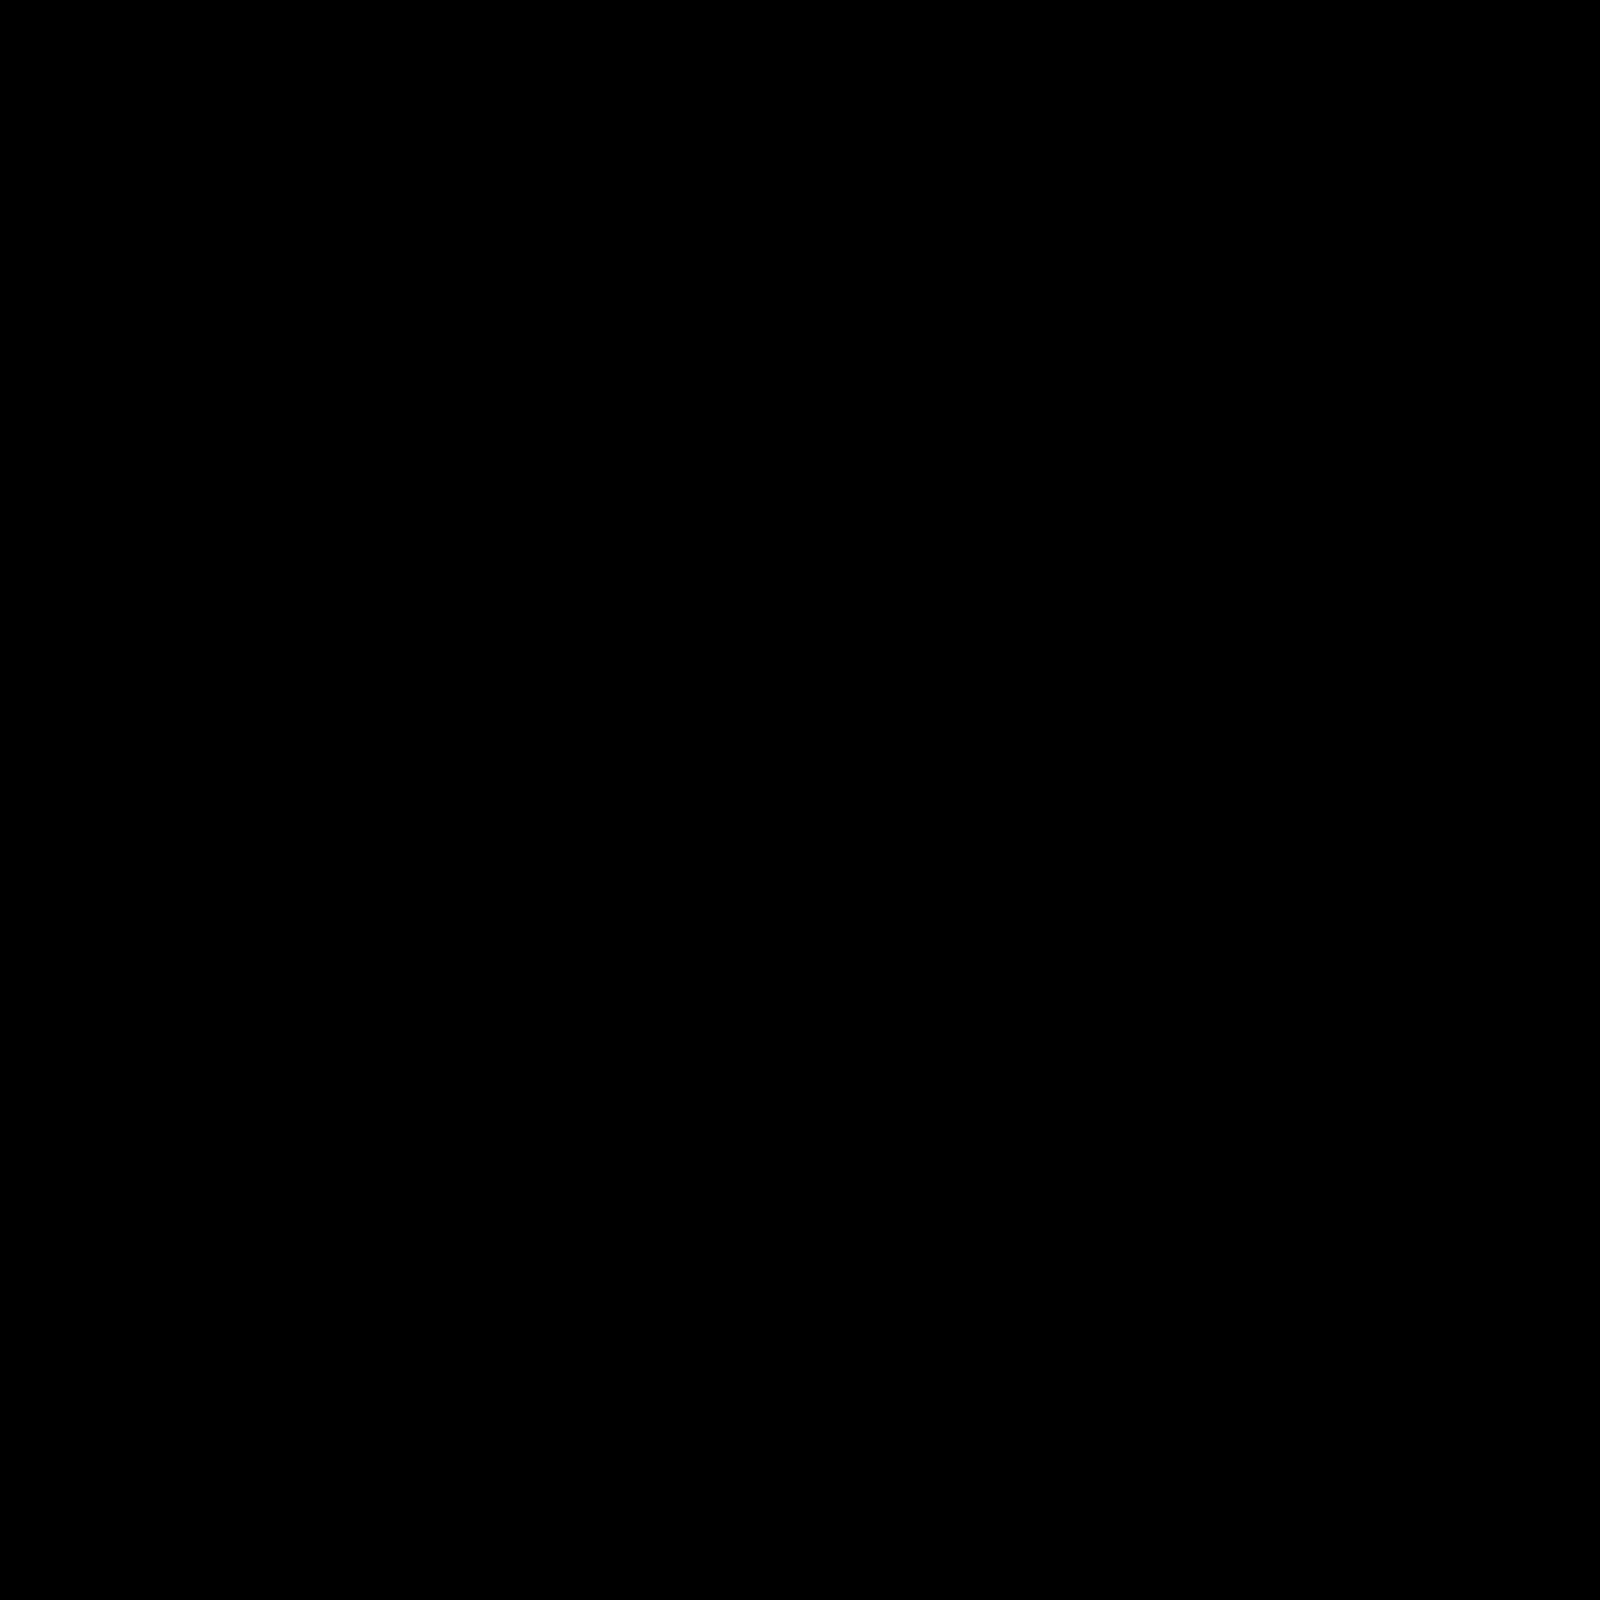 Test Vector